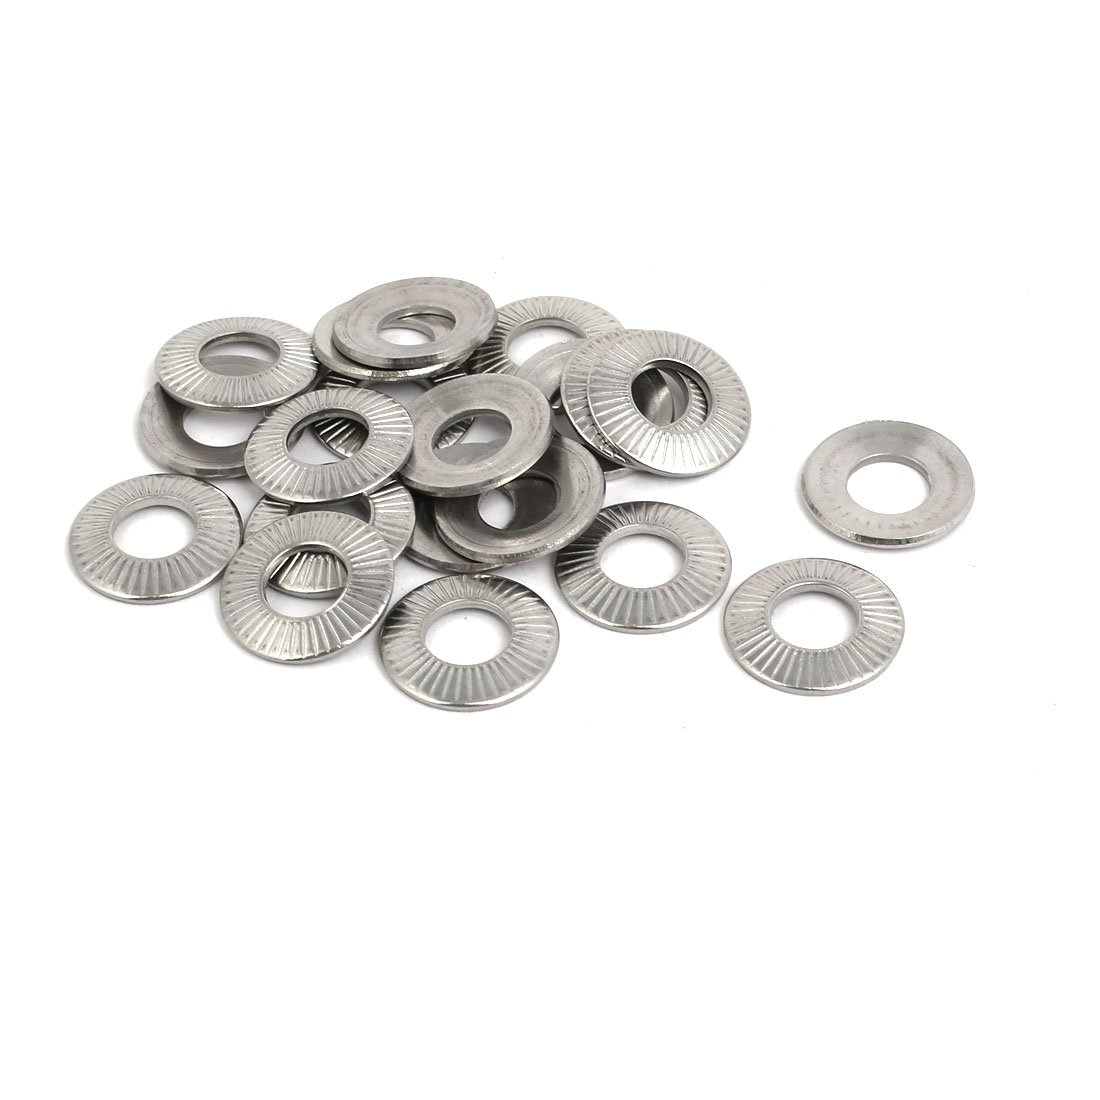 Wedge locking washer 254 SMO Stainless Steel M27 1 glued pairs//pack